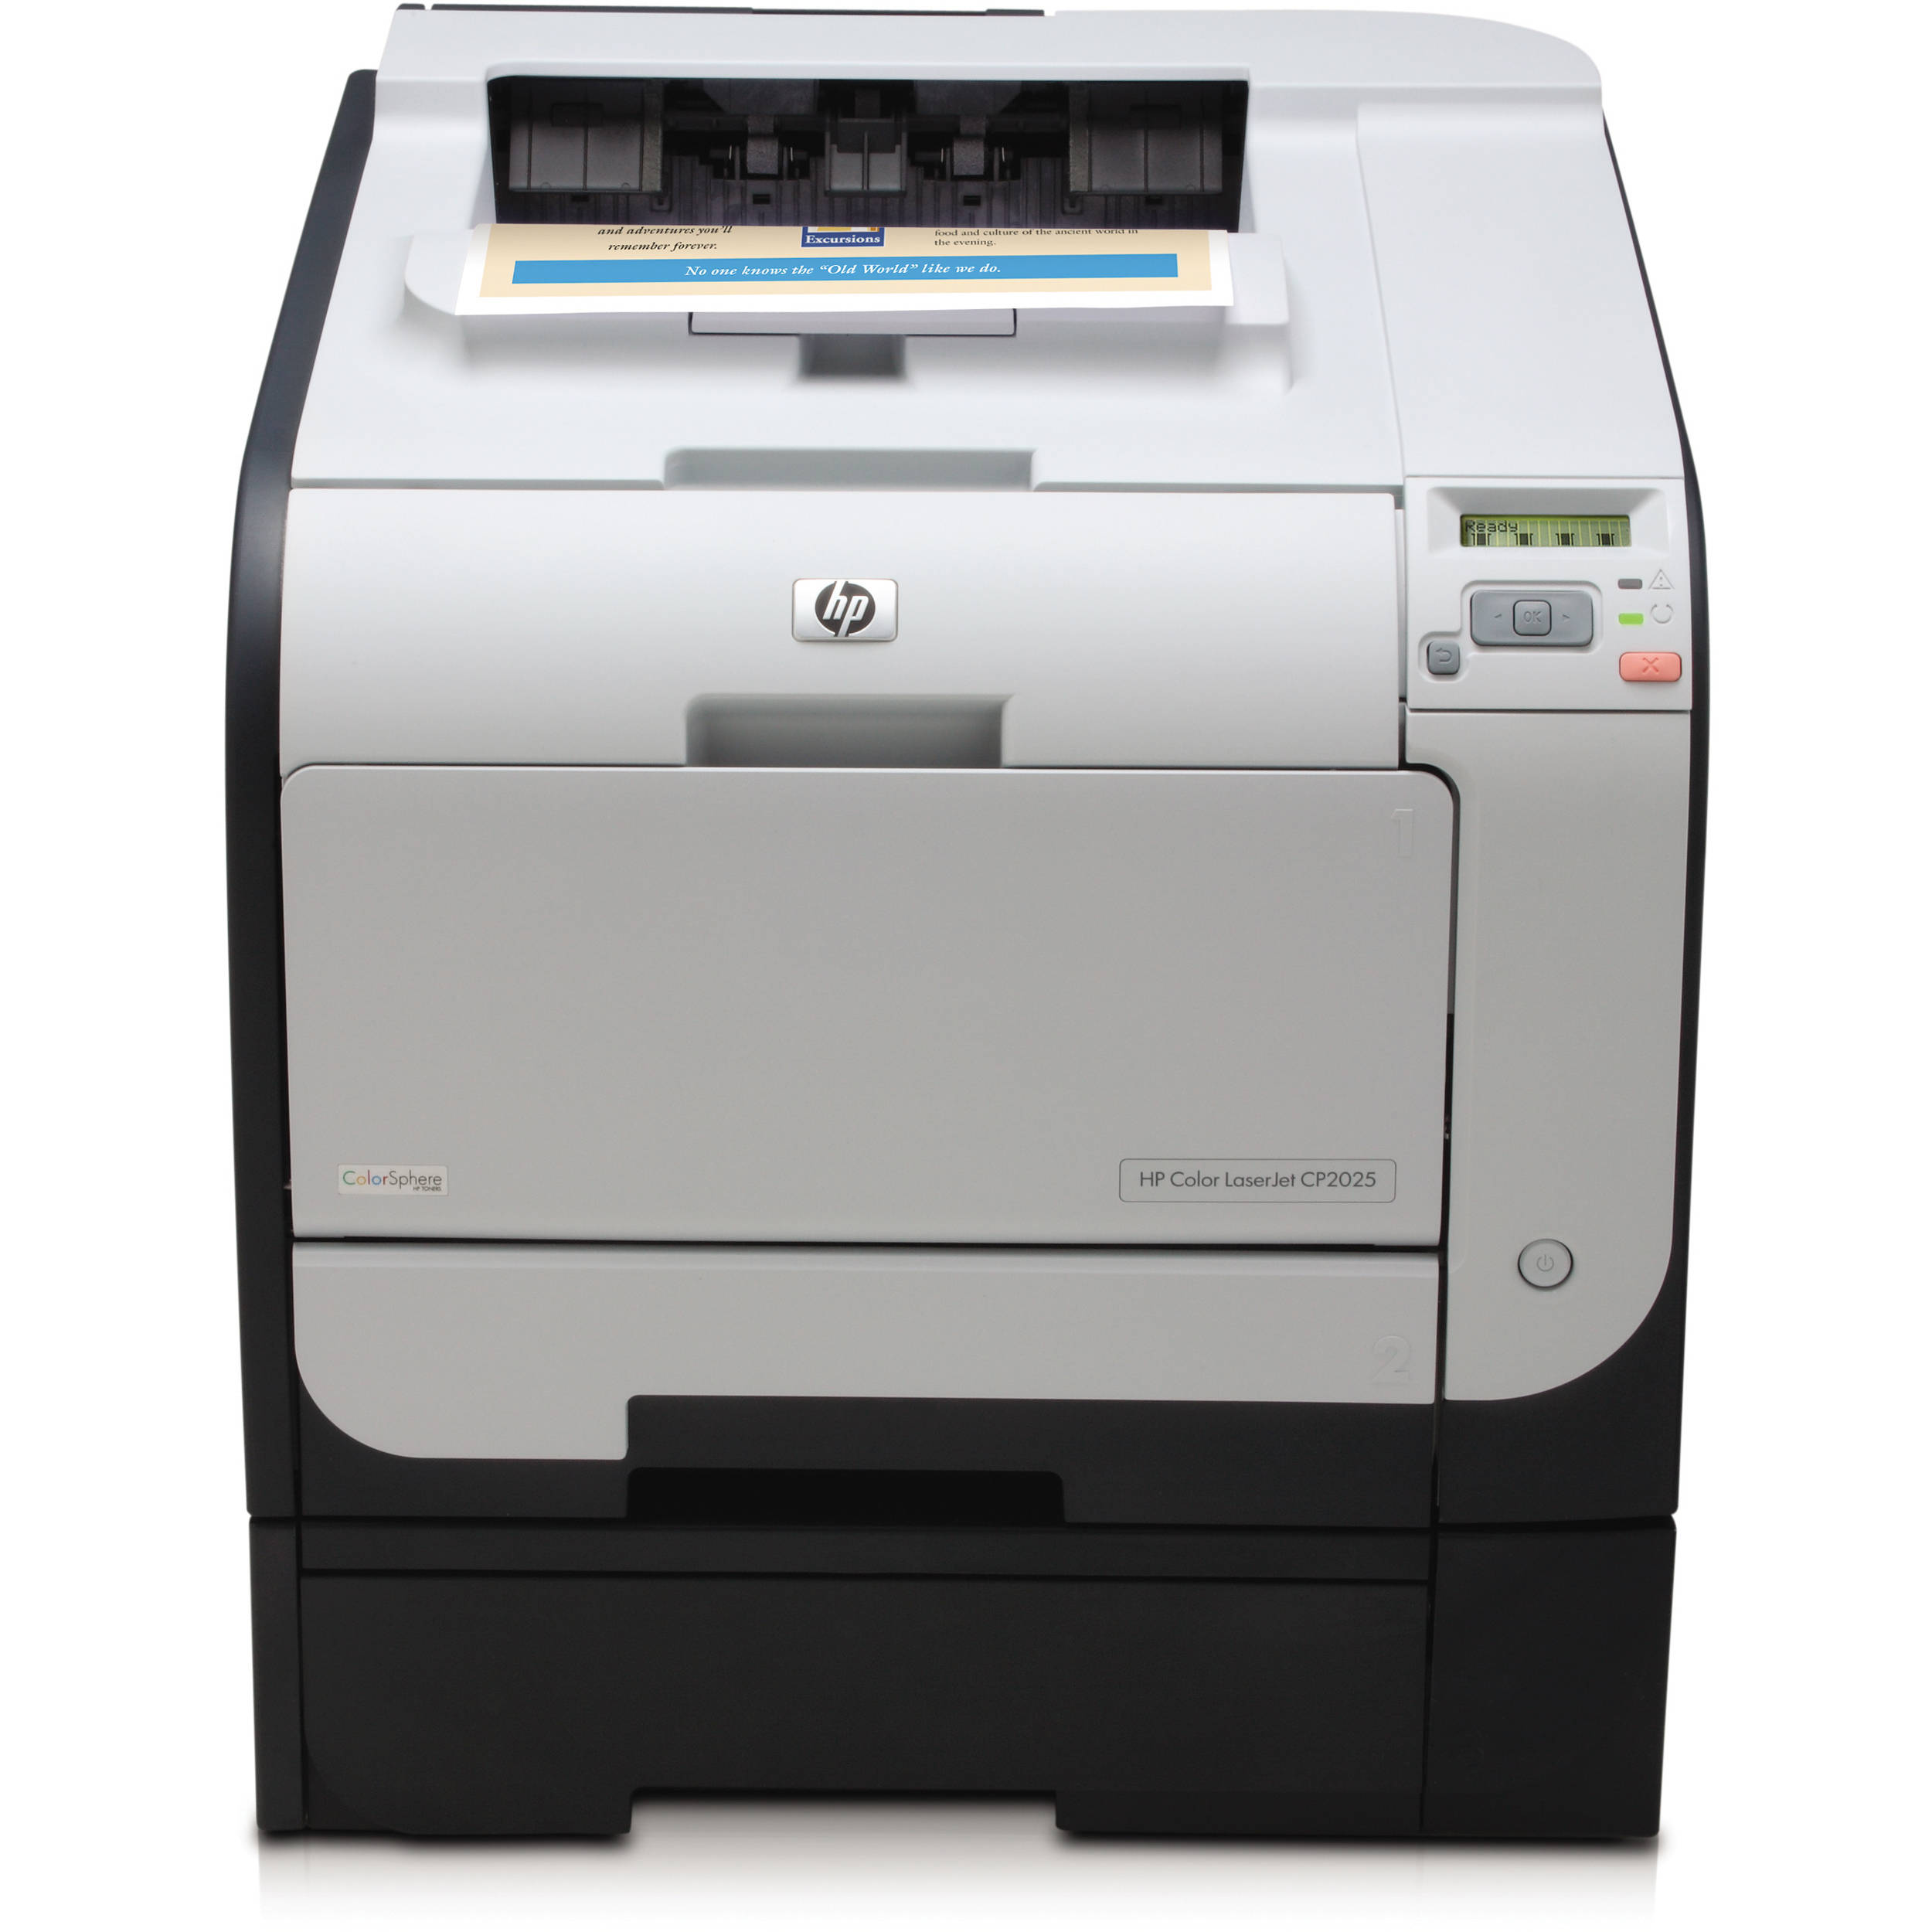 AIM Refurbish - Color LaserJet CP-2025X Network Laser Printer (AIMCB496A)